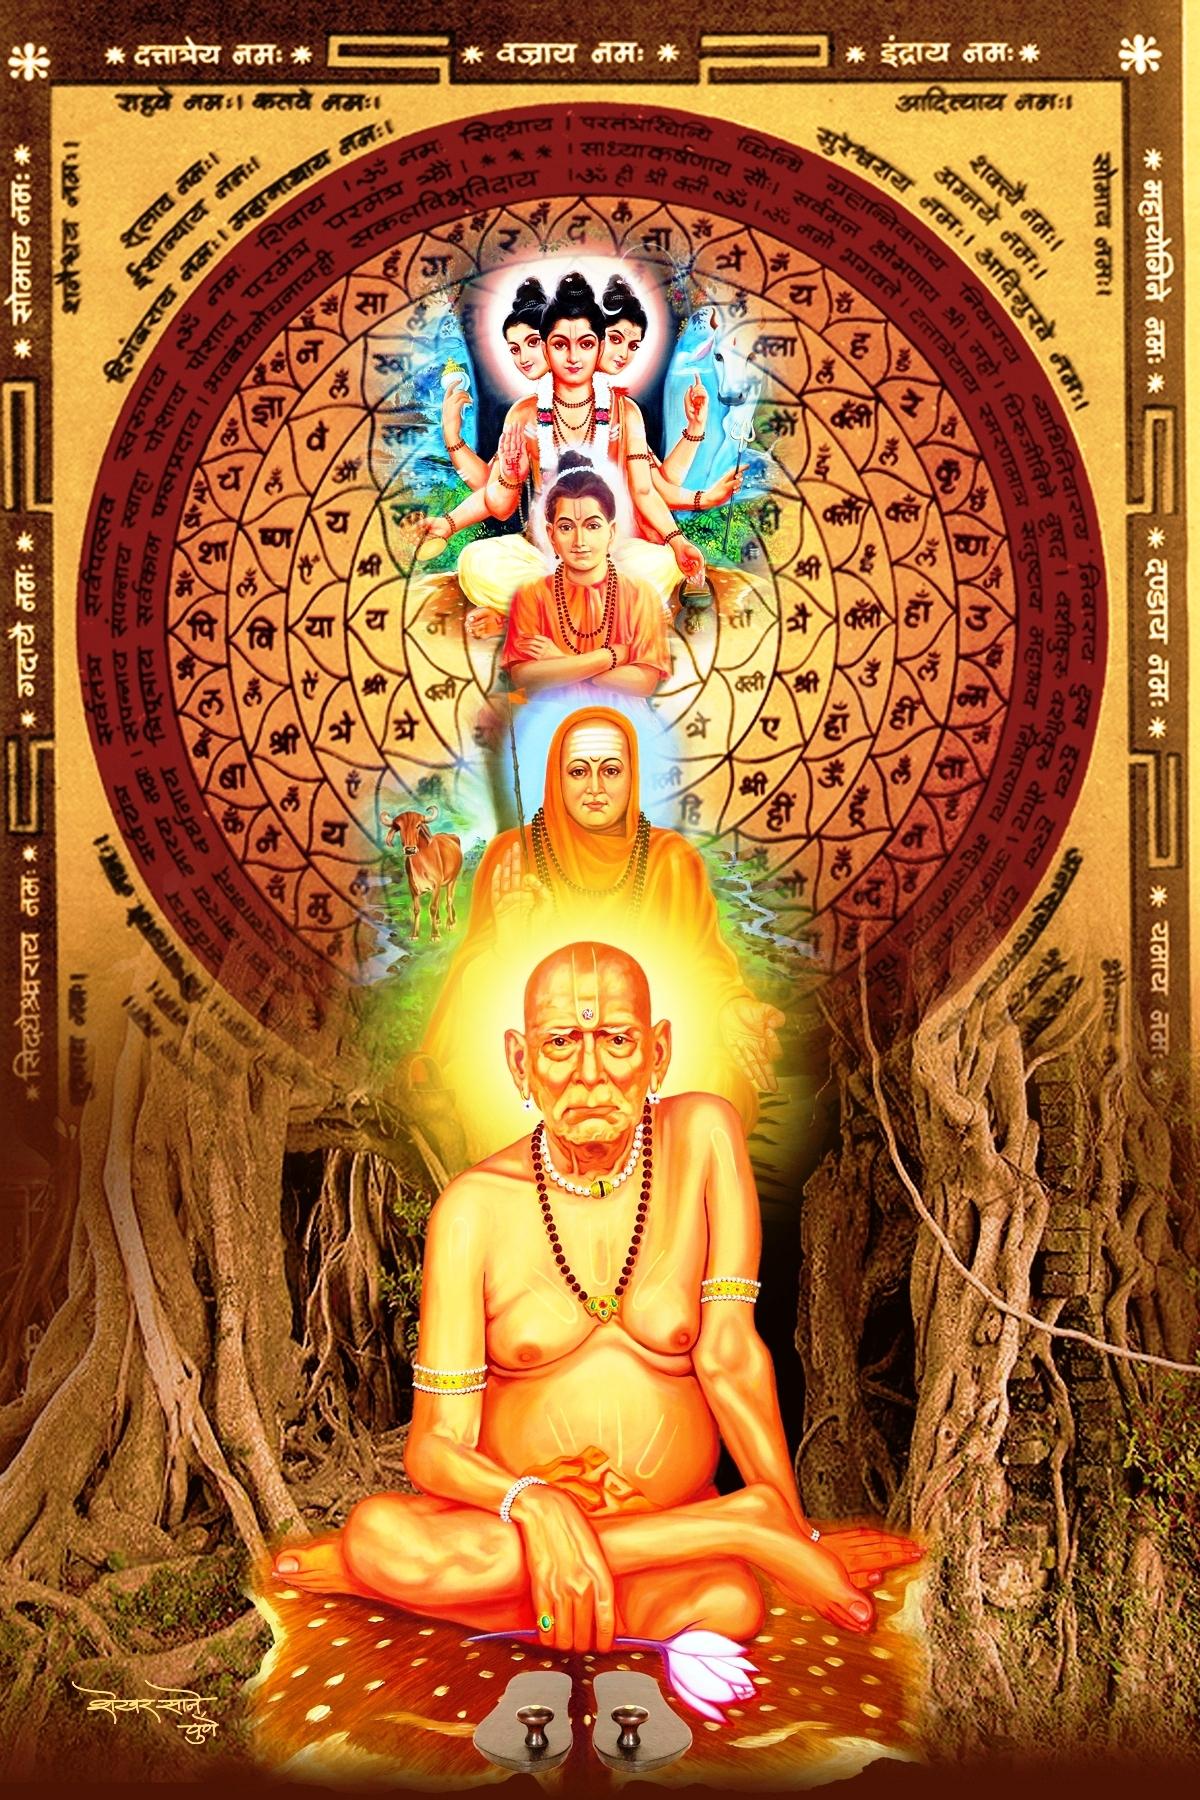 Swami Samarth Hd Photos : Swami Samarth Wallpaper For Pc